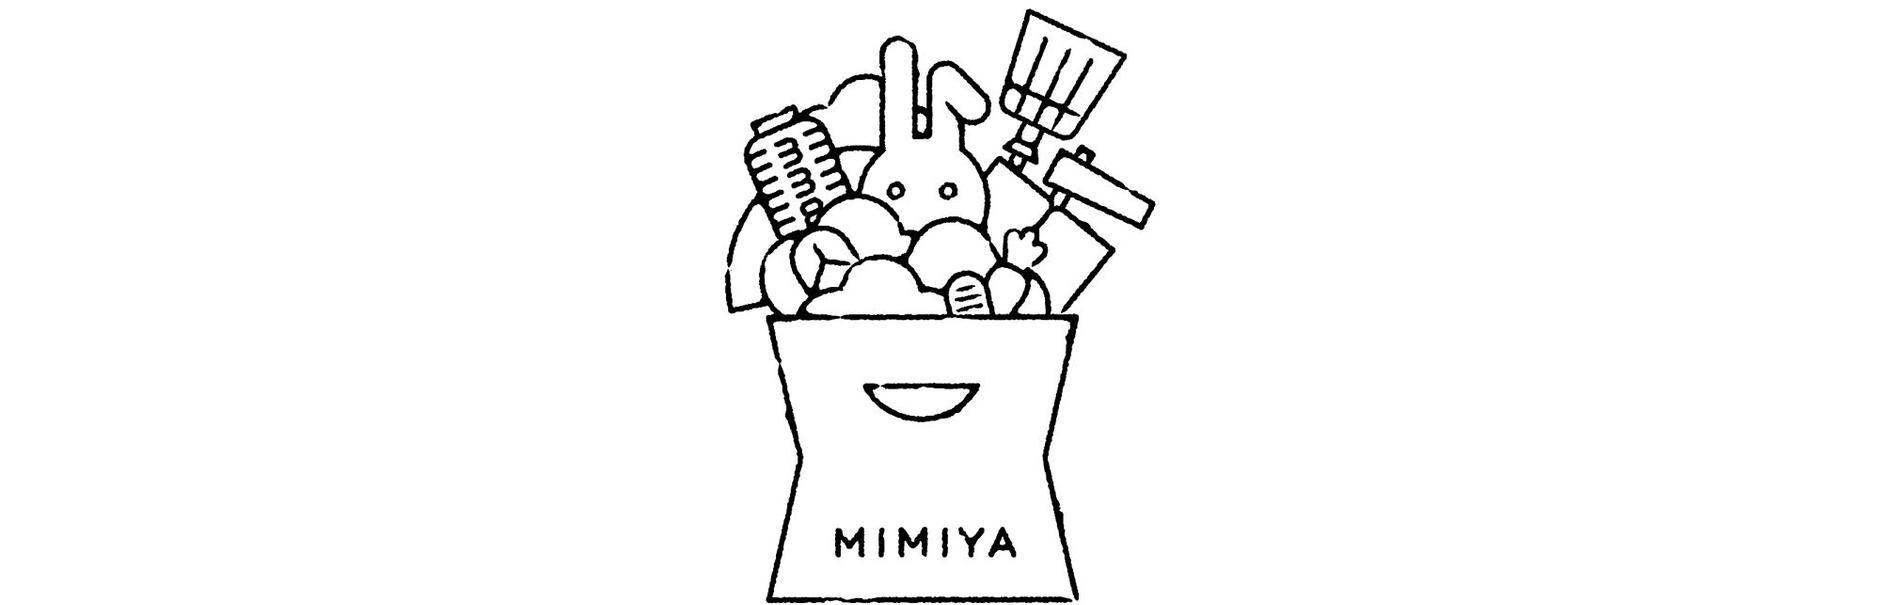 mimiya online store